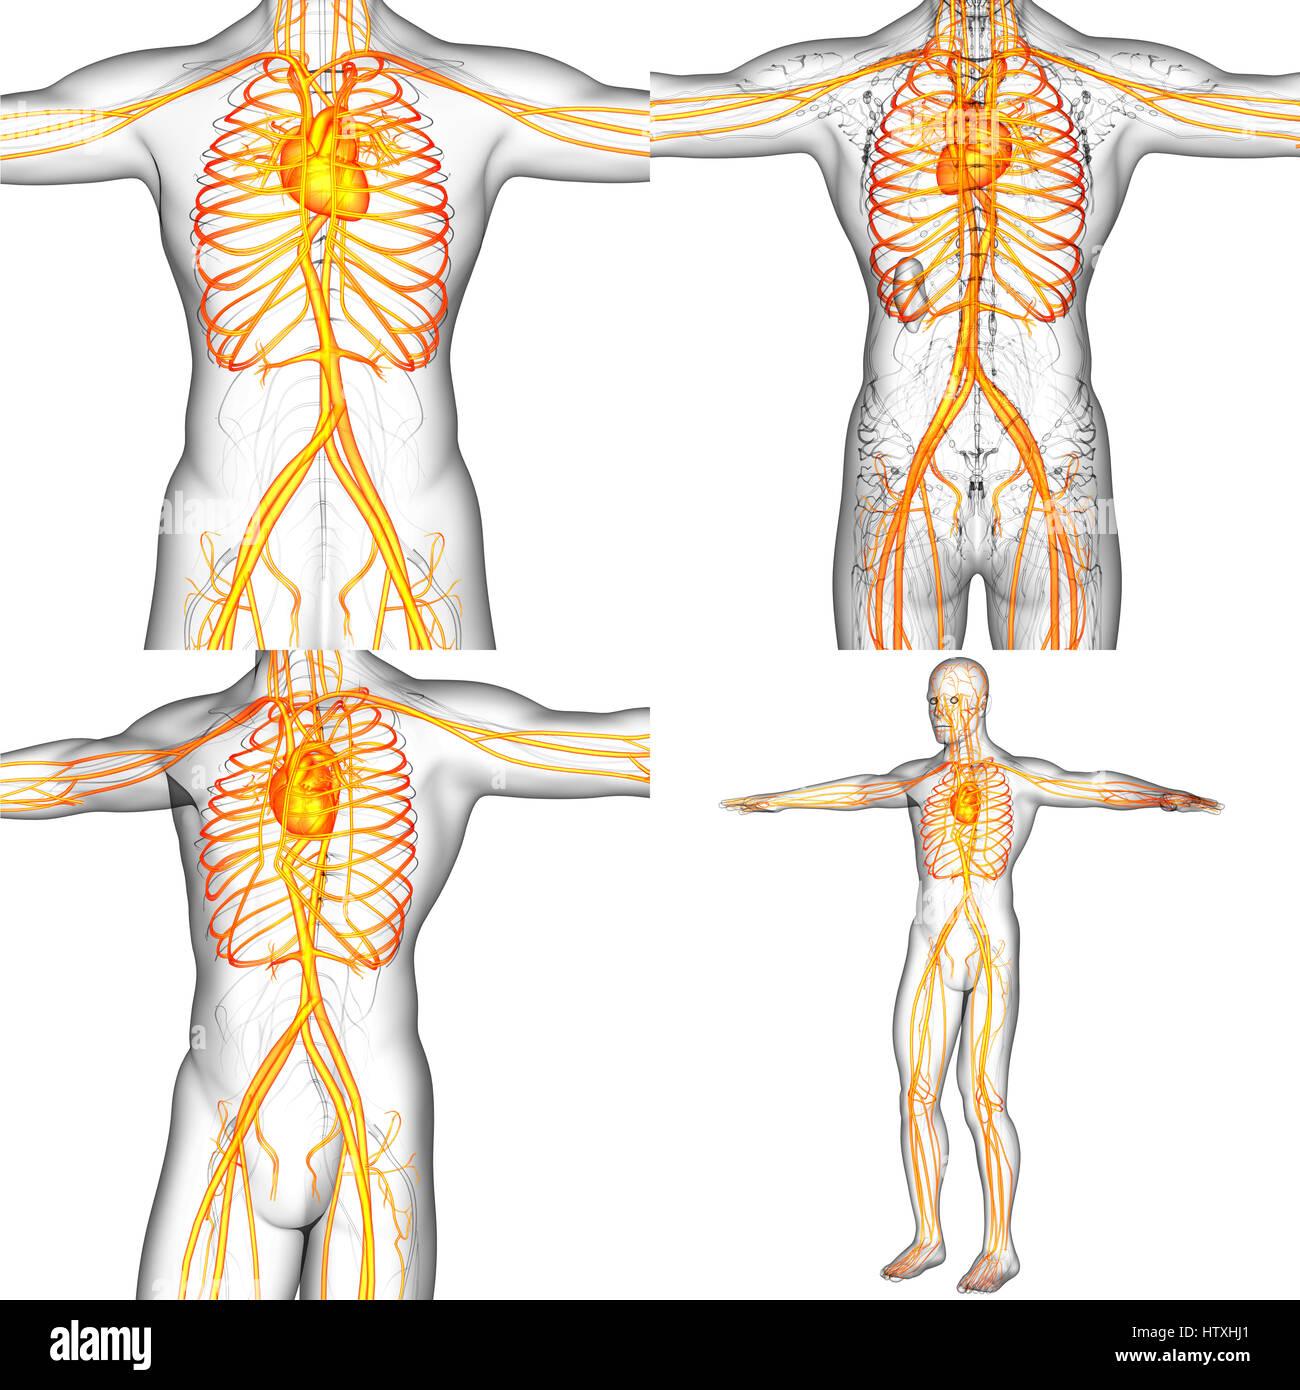 Human Vascular System Stock Photos Human Vascular System Stock